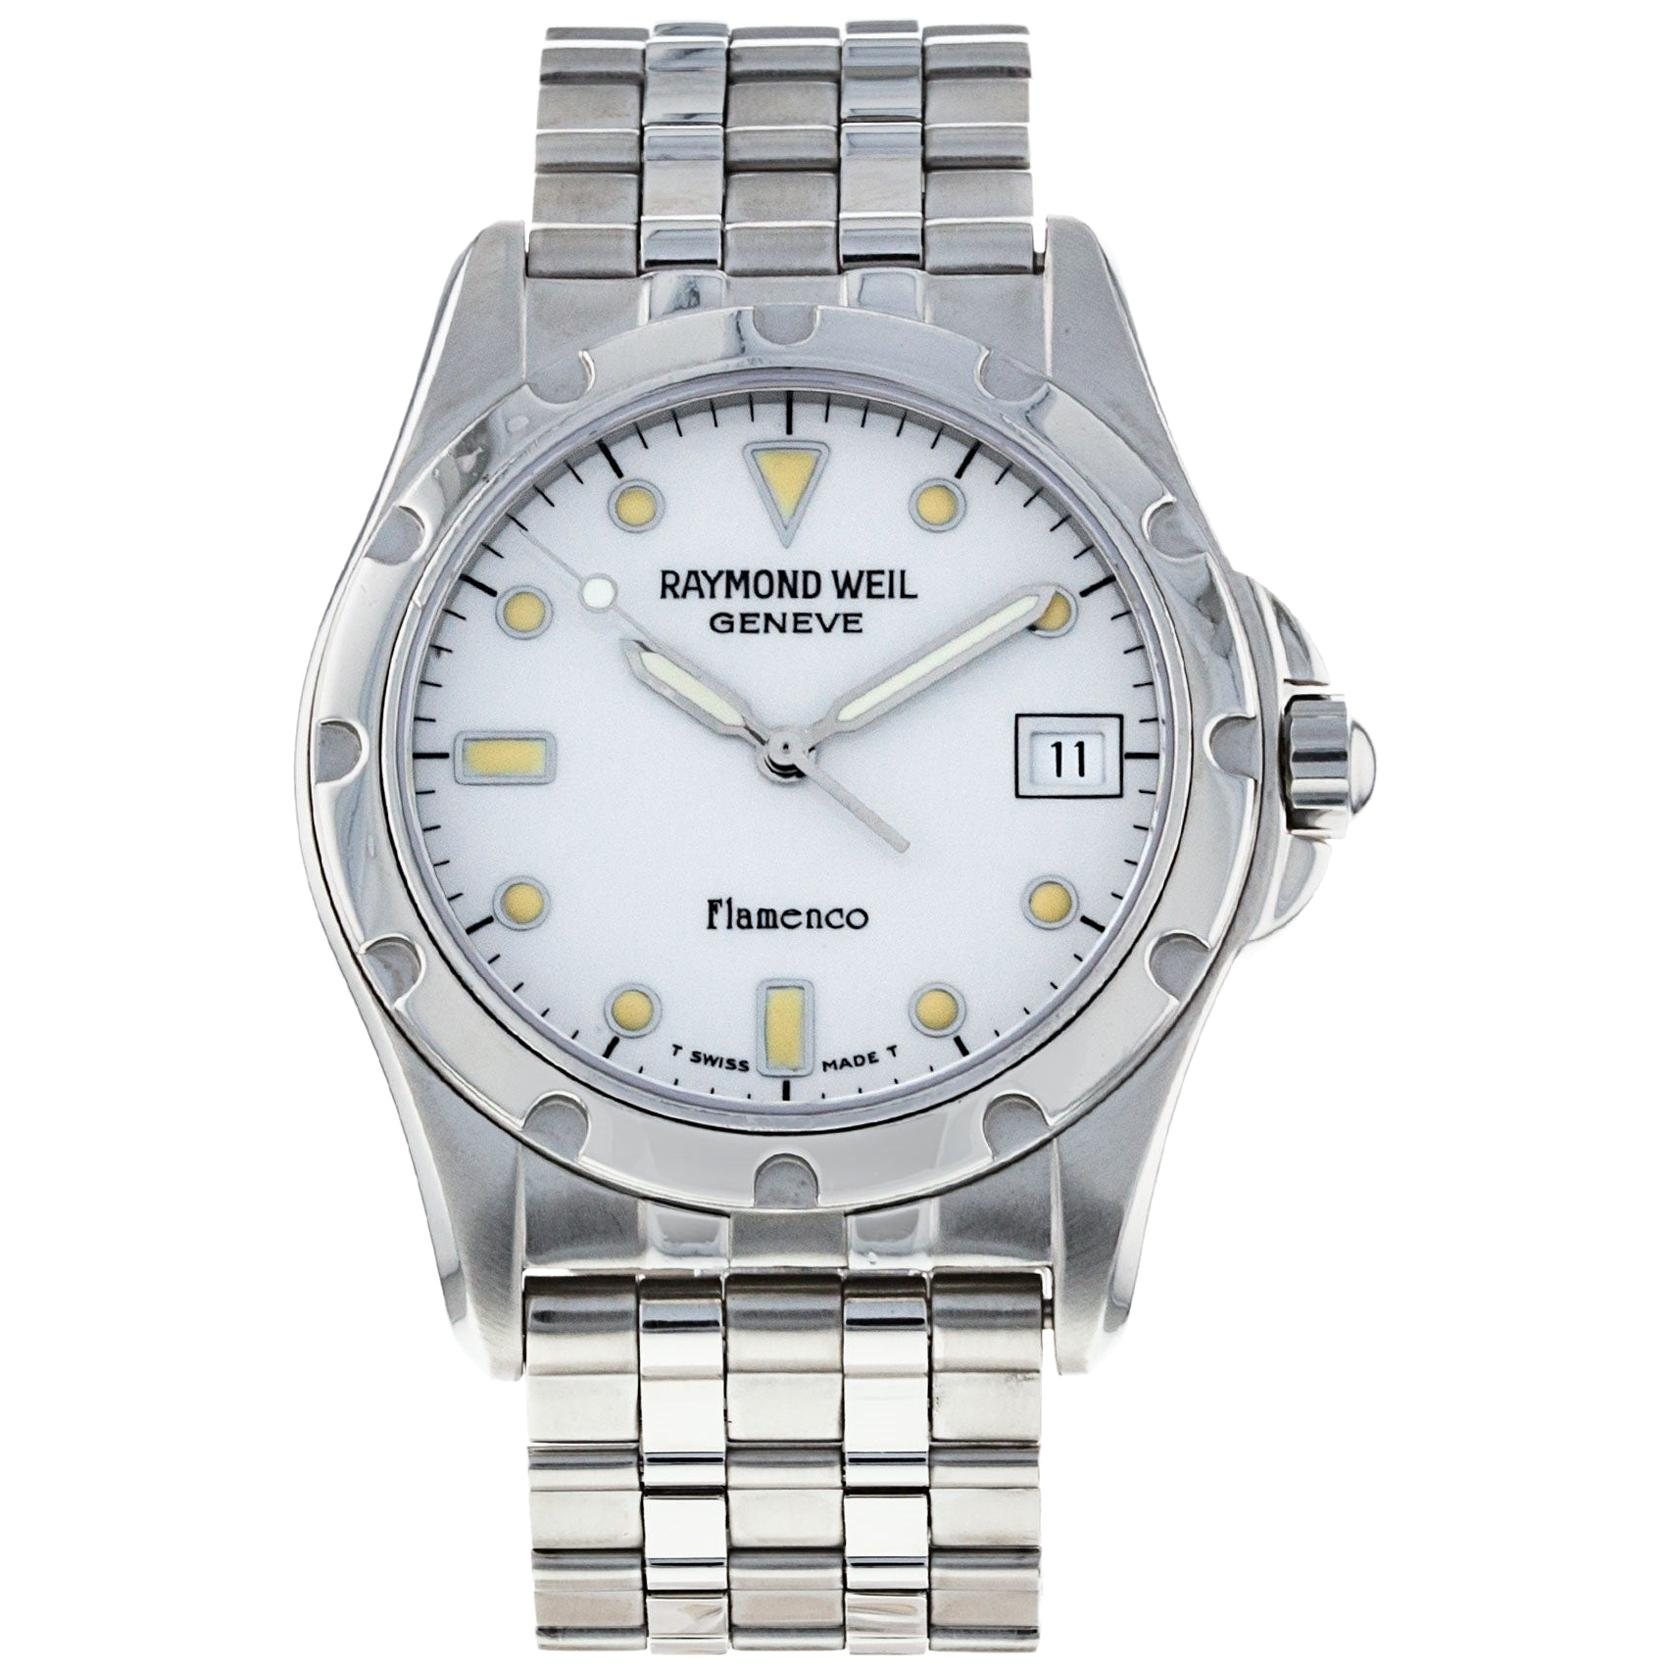 Raymond Weil Flamenco Stainless Steel Watch with Date & Box